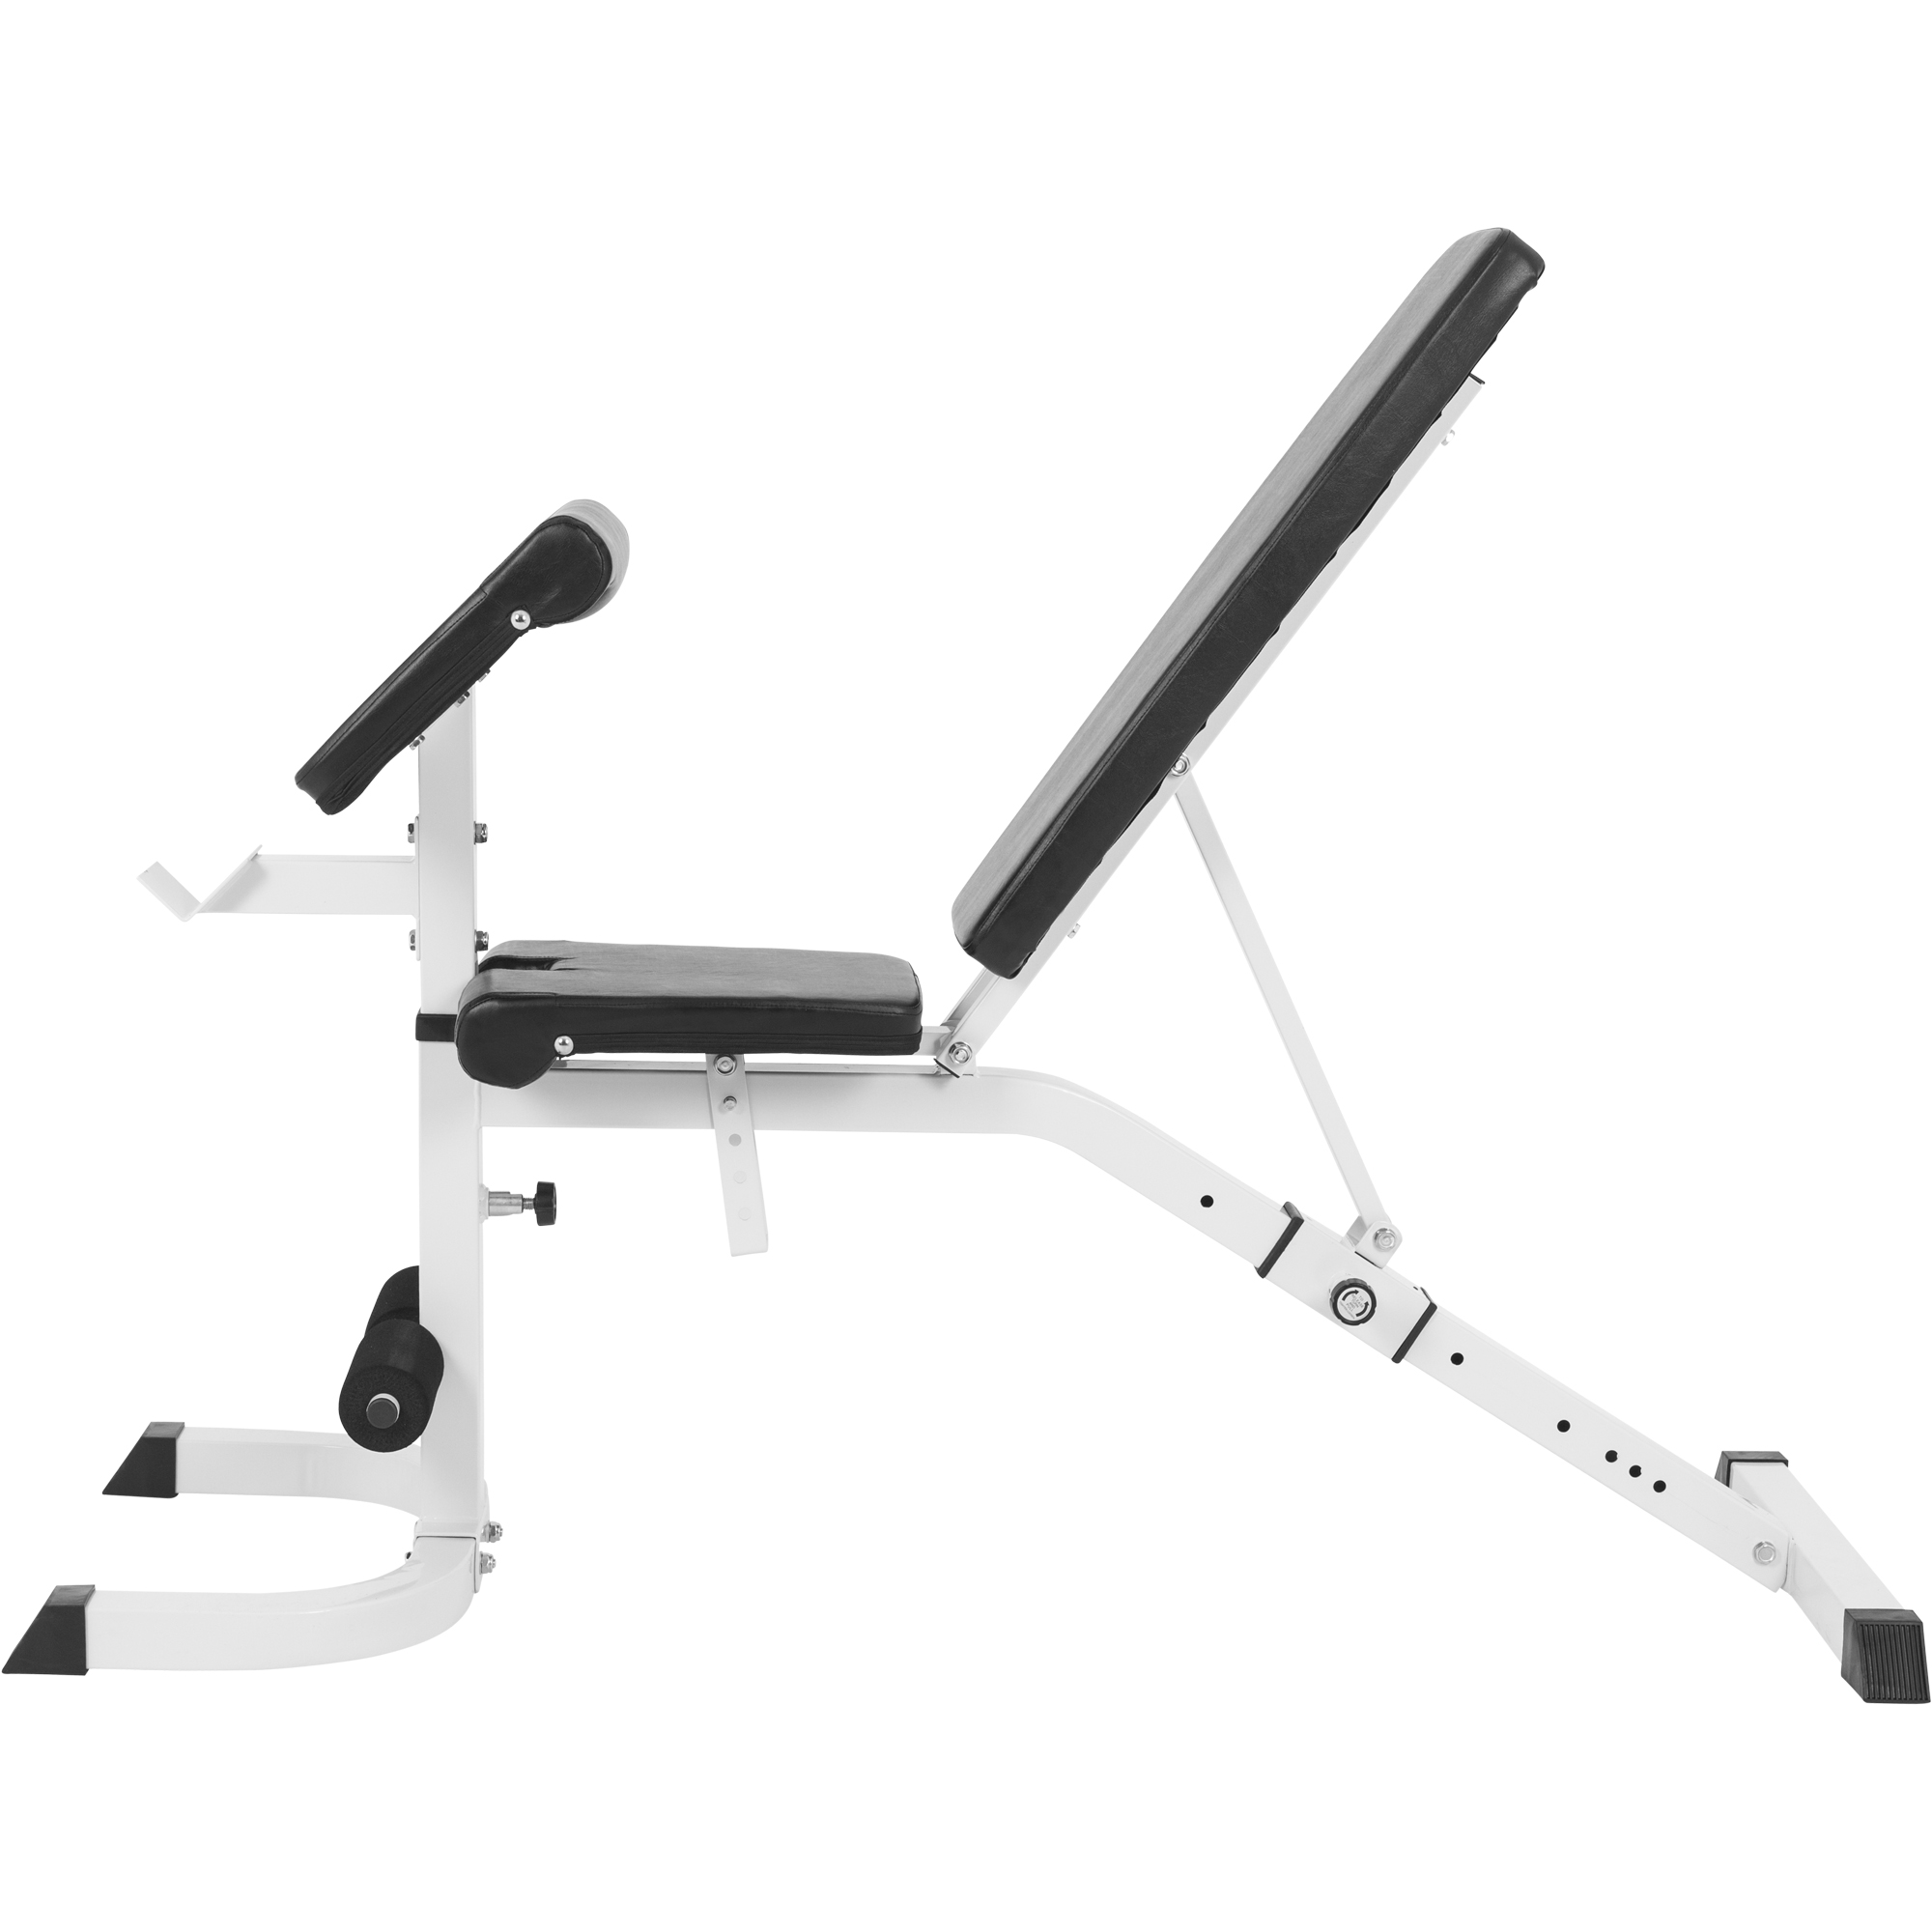 banc de musculation r glable inclin d clin avec pupitre biceps 10000770. Black Bedroom Furniture Sets. Home Design Ideas